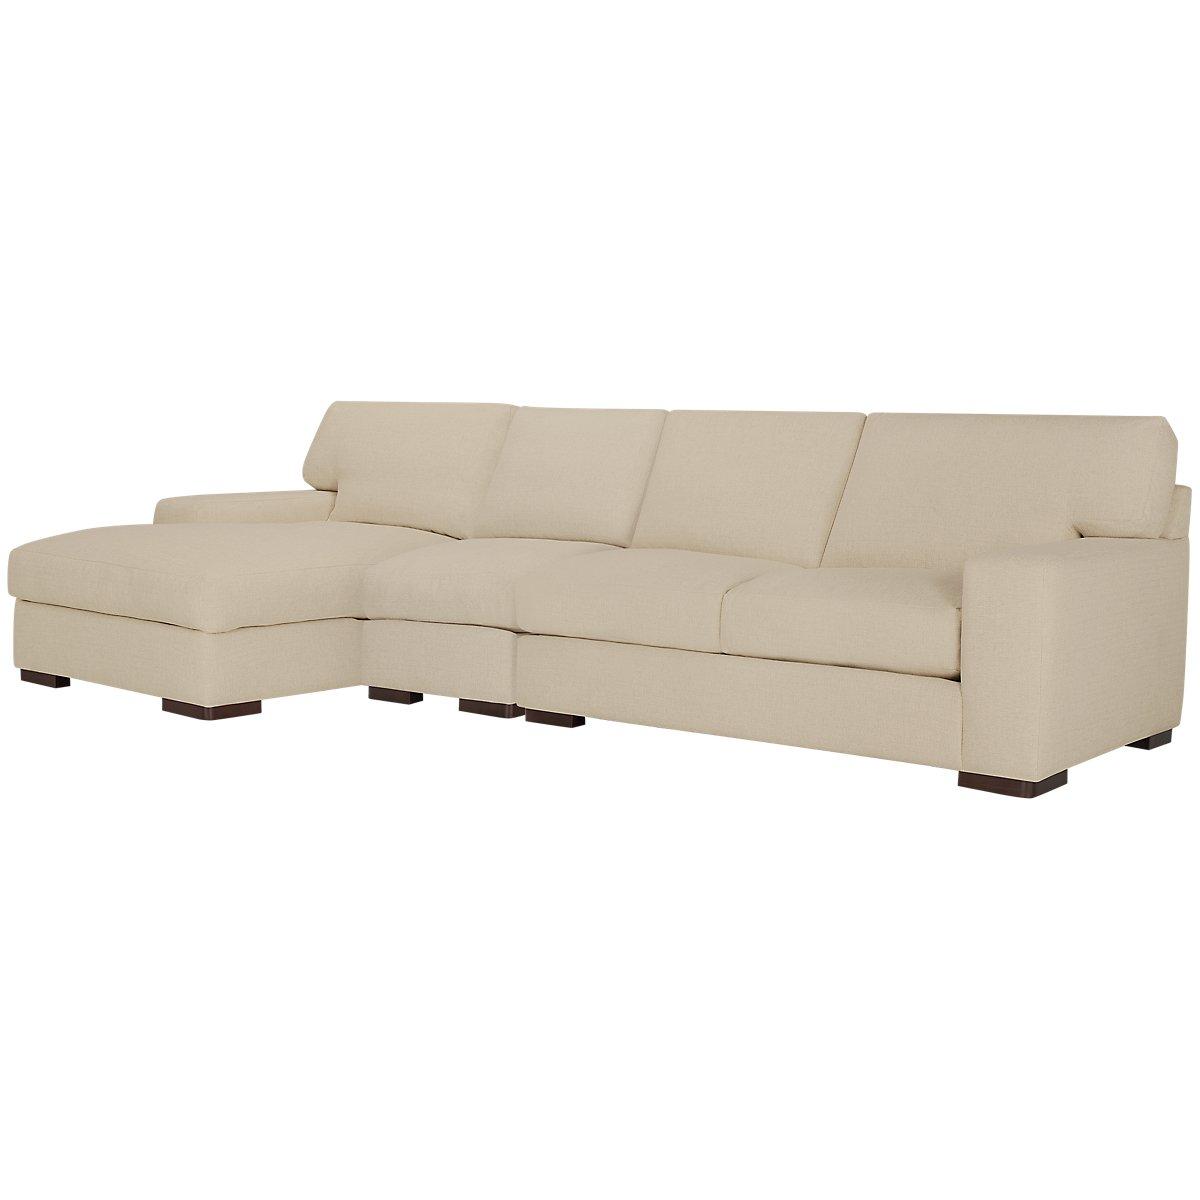 City furniture veronica khaki down small left chaise for Chaise kaki